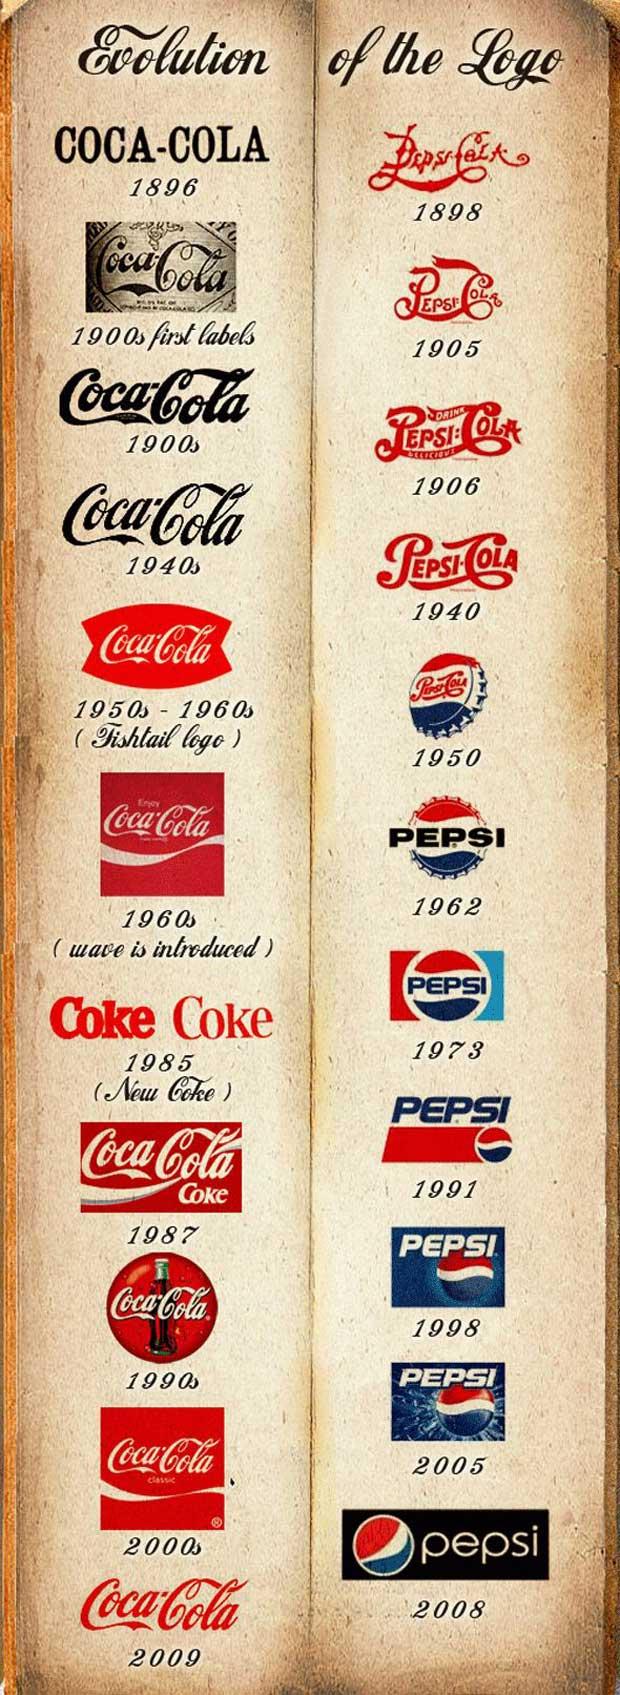 Creating branding ideas for brand logo of Coca-Cola and Pepsi